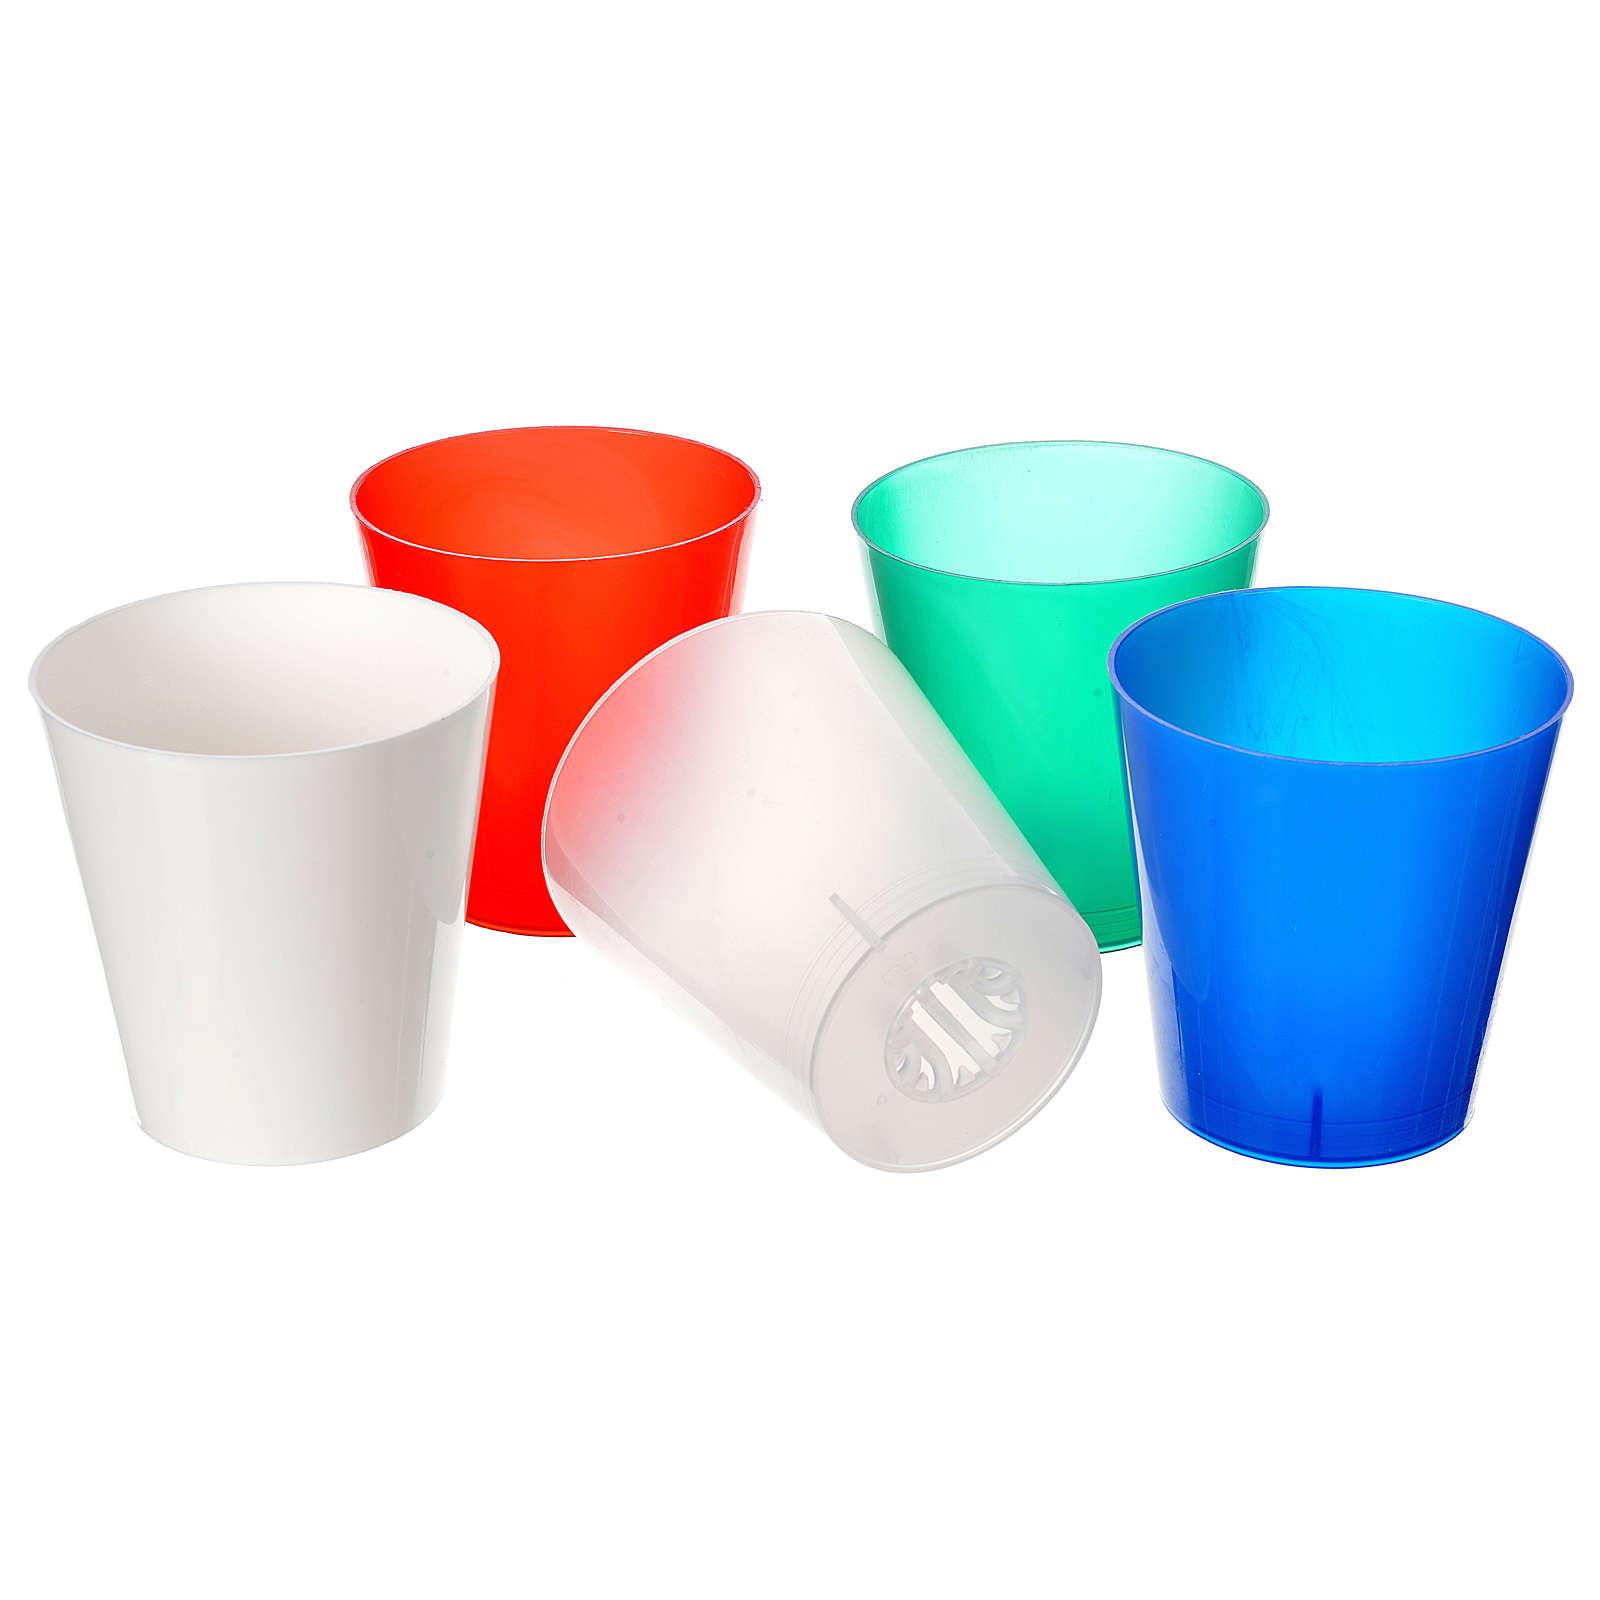 Flambeaux plastikowy kolorowy ( 30 sztuk) 3